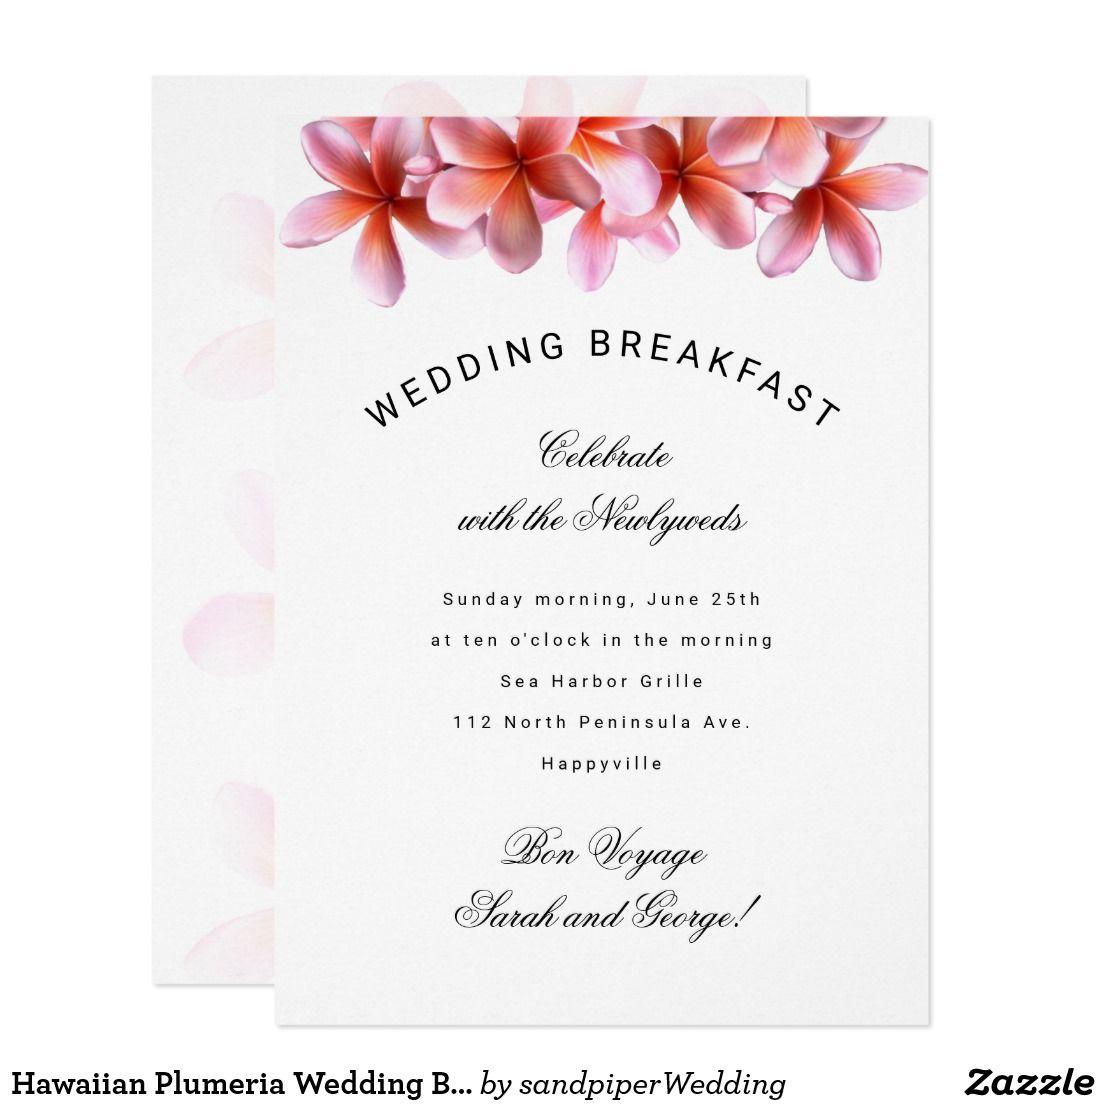 Hawaiian Plumeria Wedding Breakfast Invitation | Designer Wedding ...